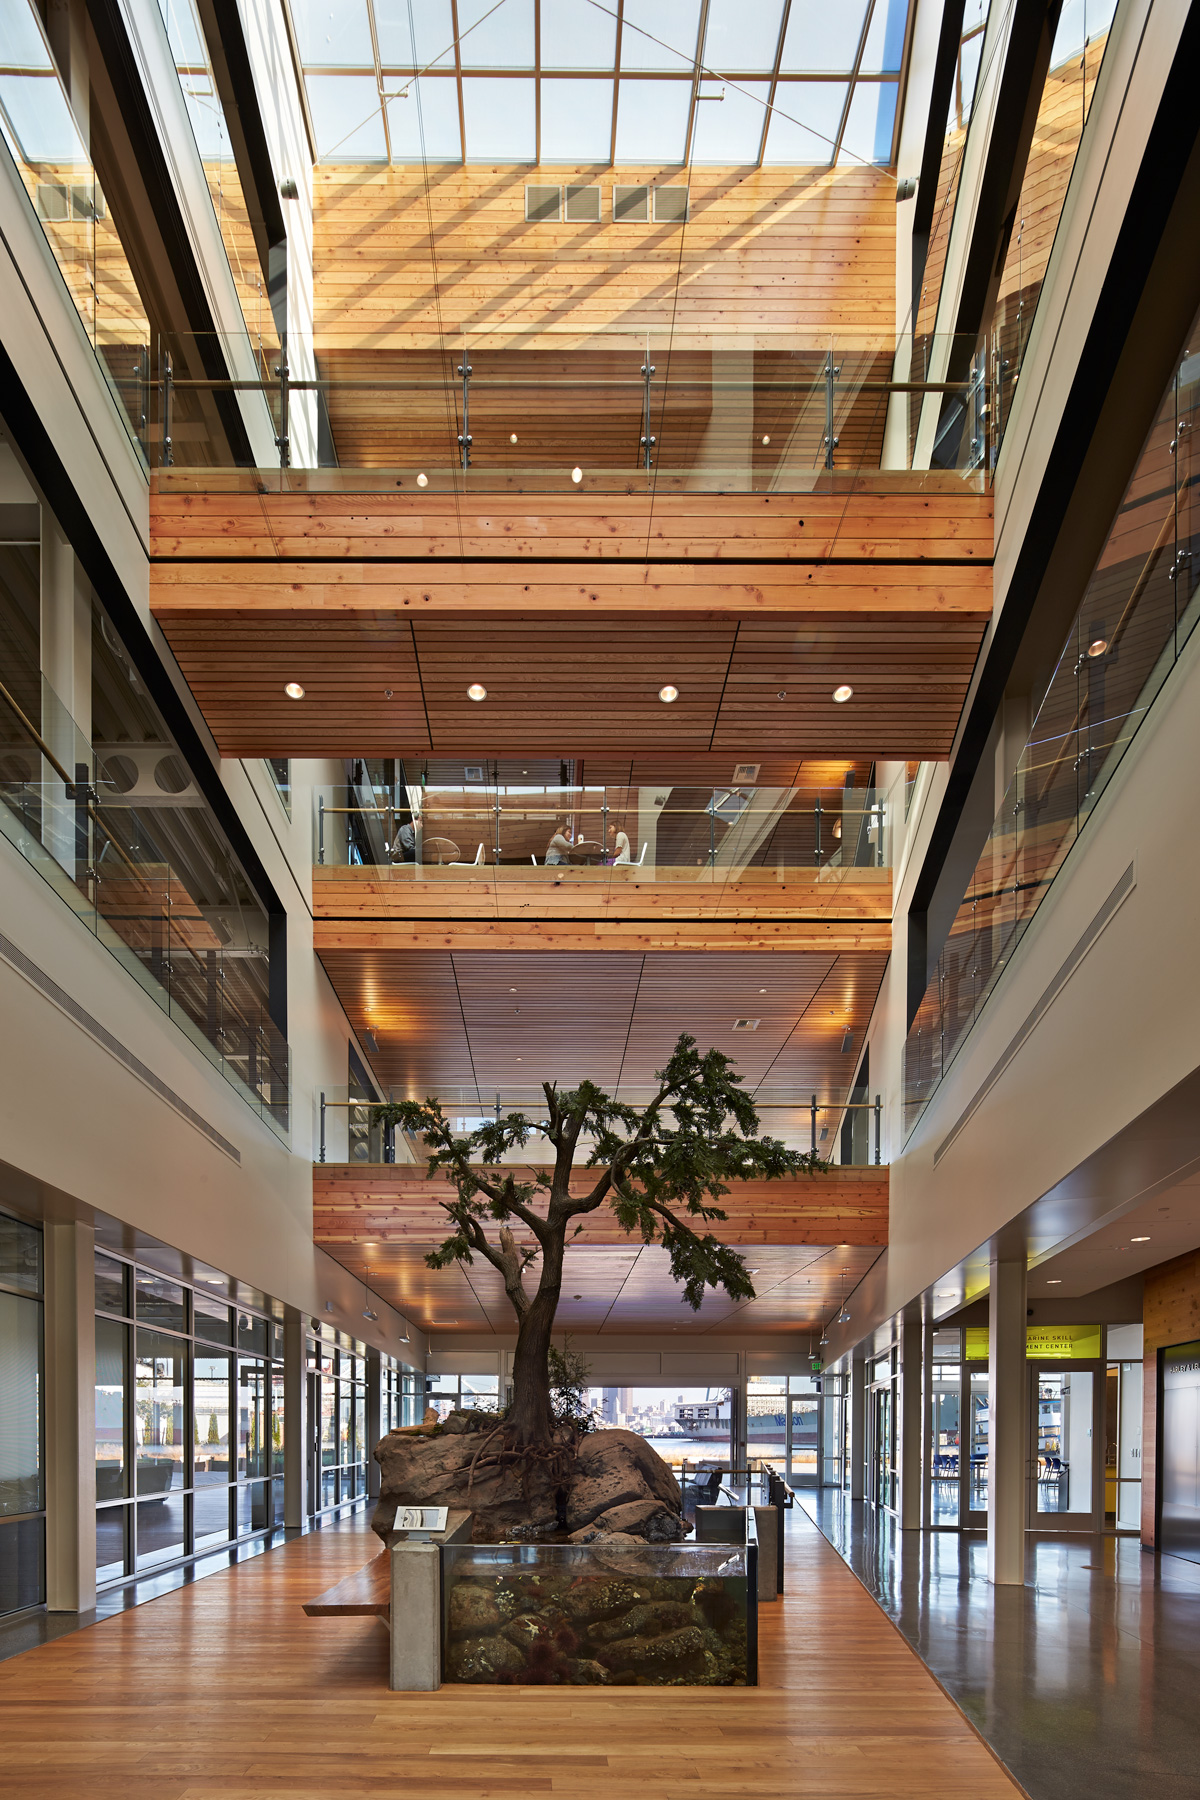 Harley and Lela Franco Maritime Center Lobby with tree